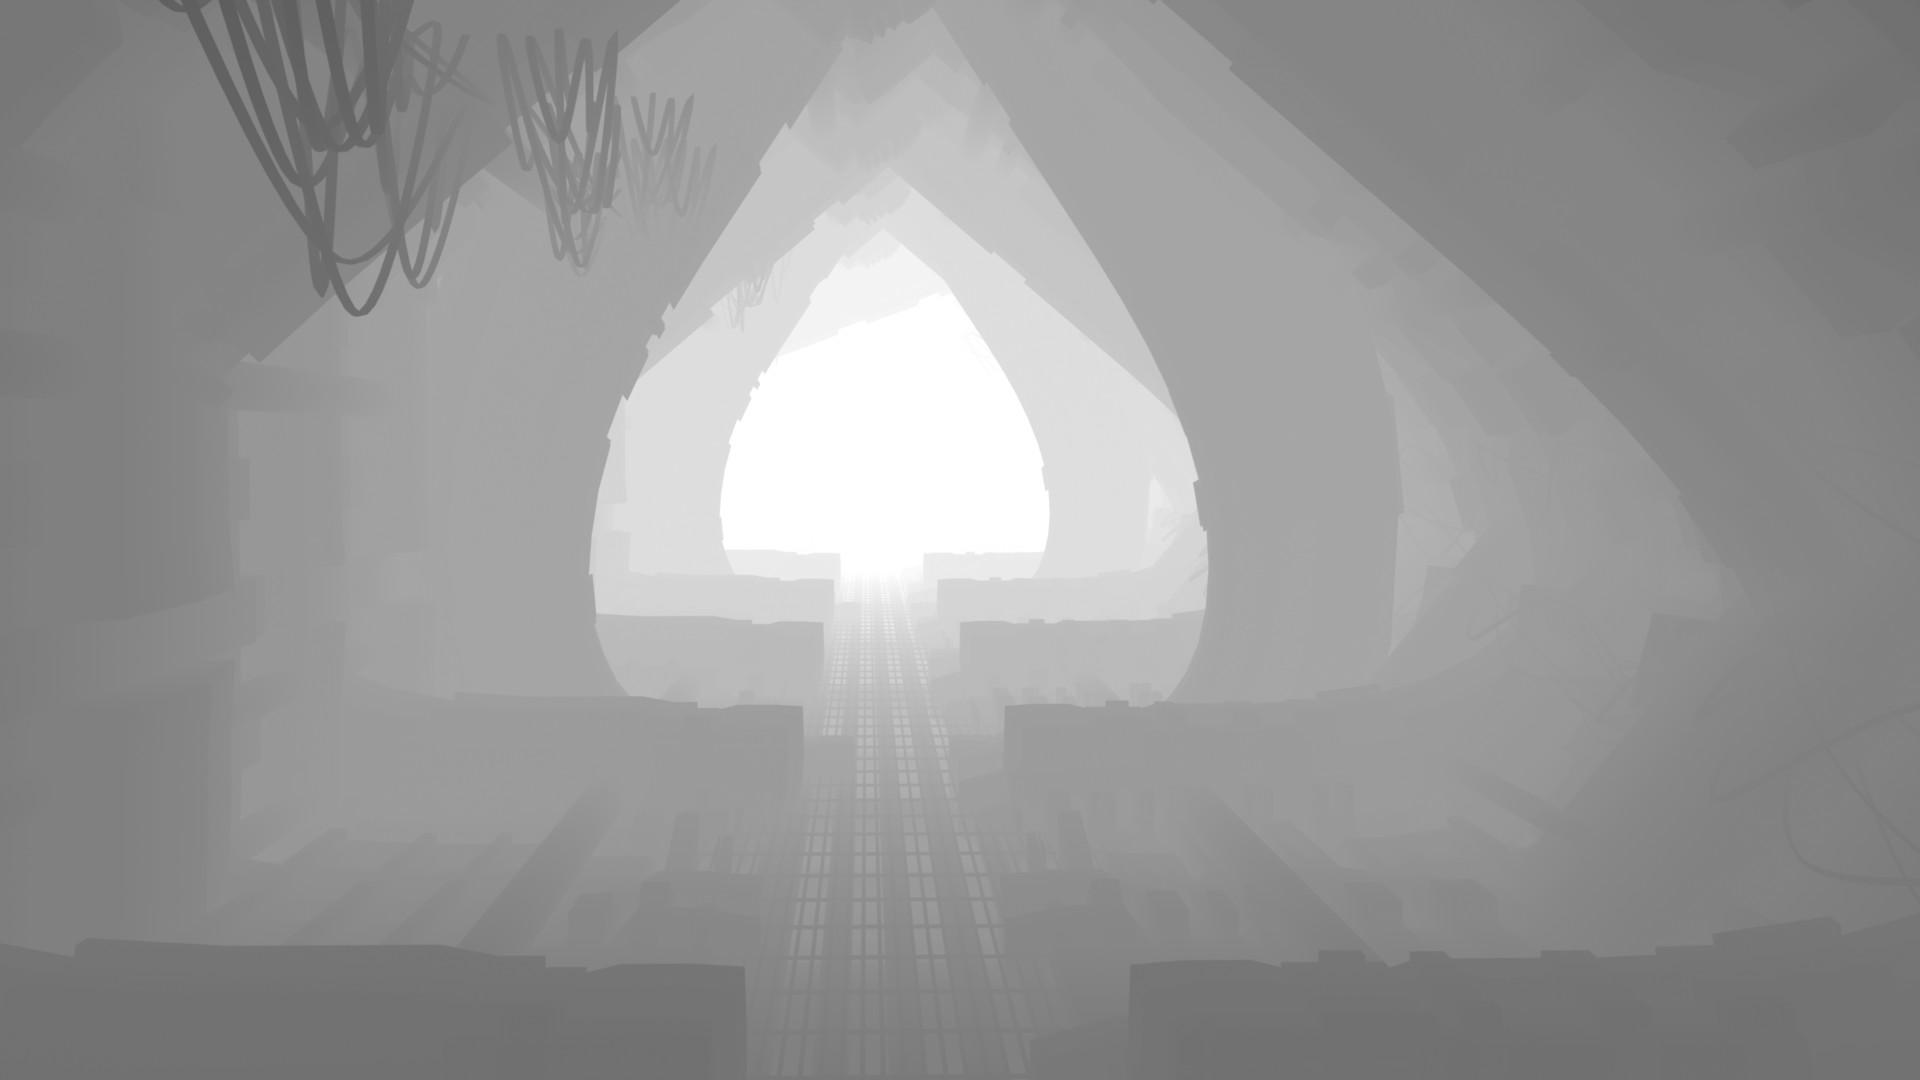 Kresimir jelusic robob3ar 233 020616 b tunnel y